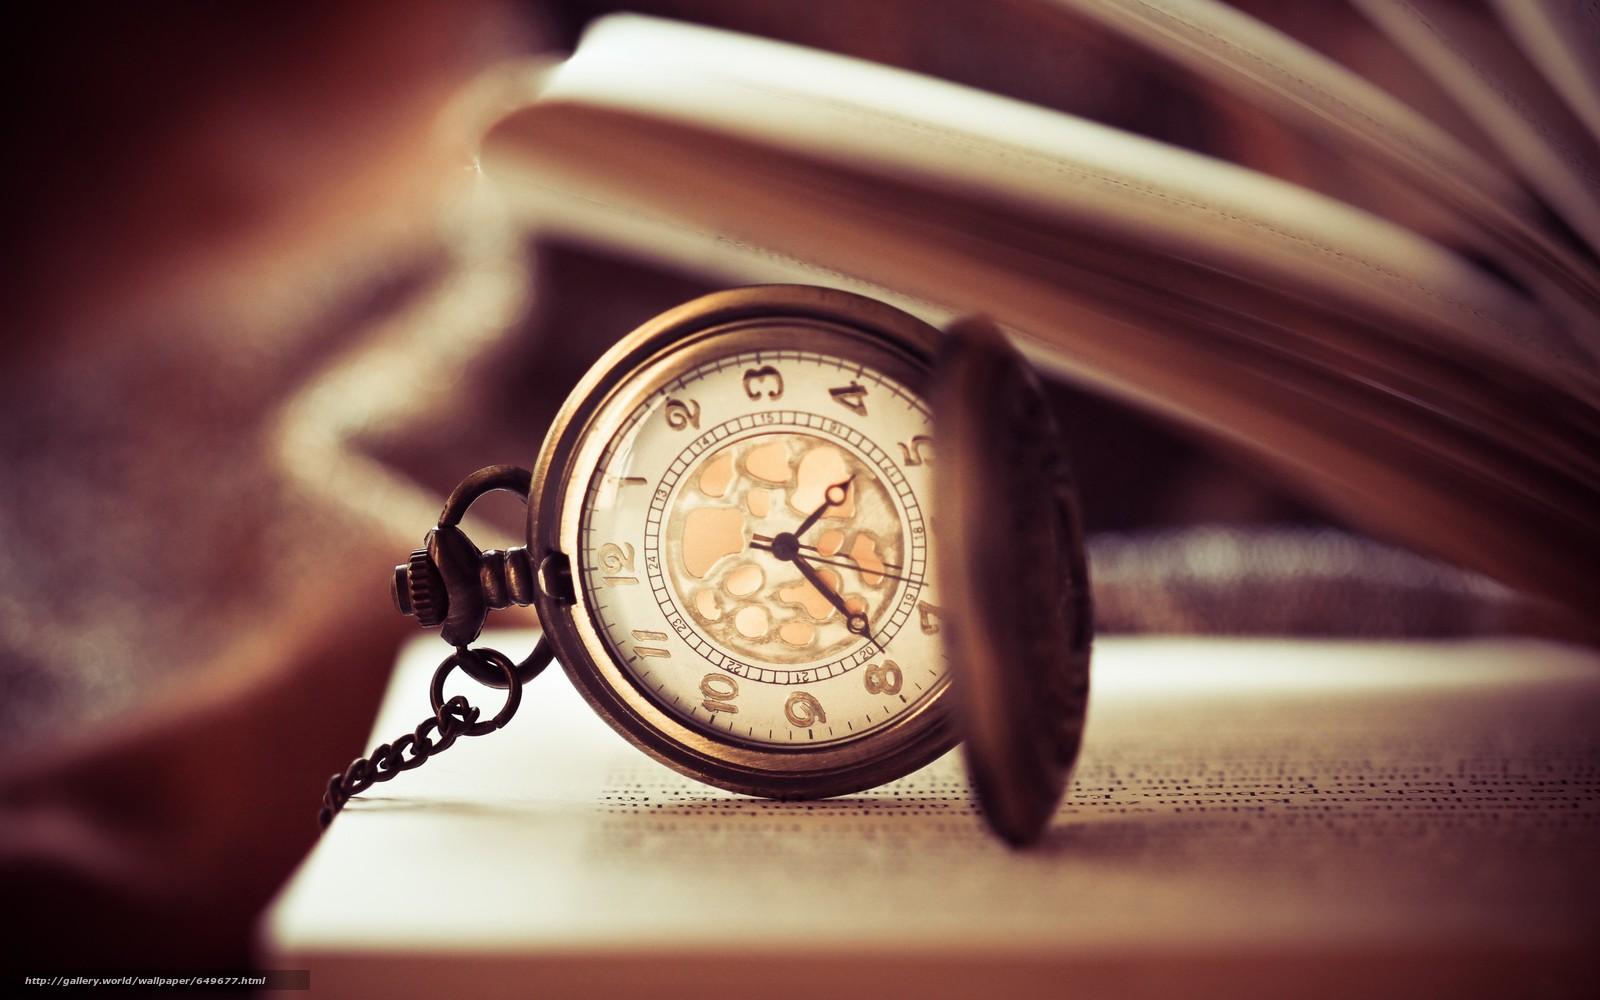 Download wallpaper watch,  watch,  book,  Pocket free desktop wallpaper in the resolution 2560x1600 — picture №649677